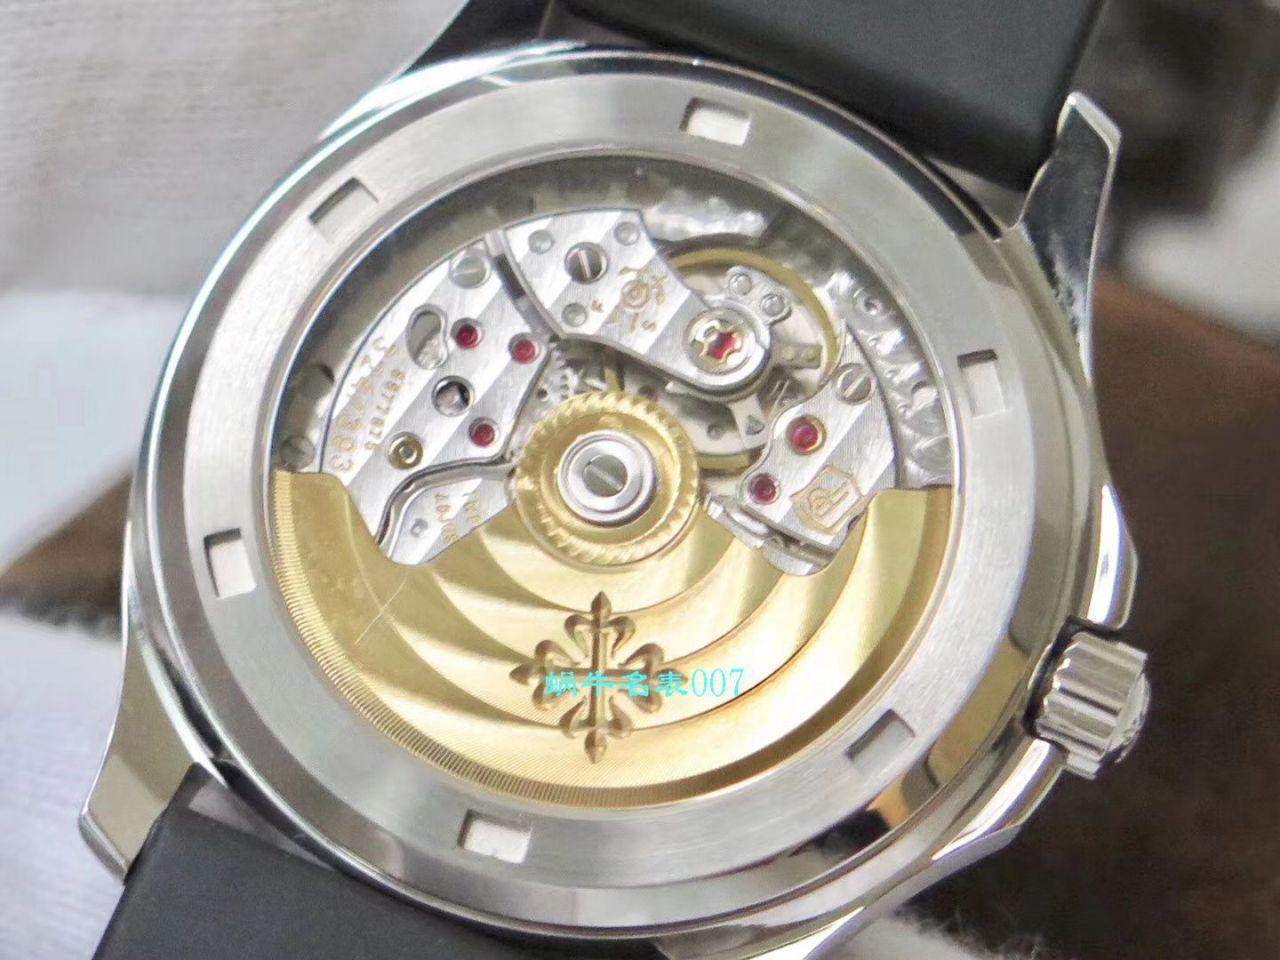 【PPF厂PATEK PHILIPPE复刻表】百达翡丽AQUANAUT系列5069G-001 白金女士腕表 / BD230